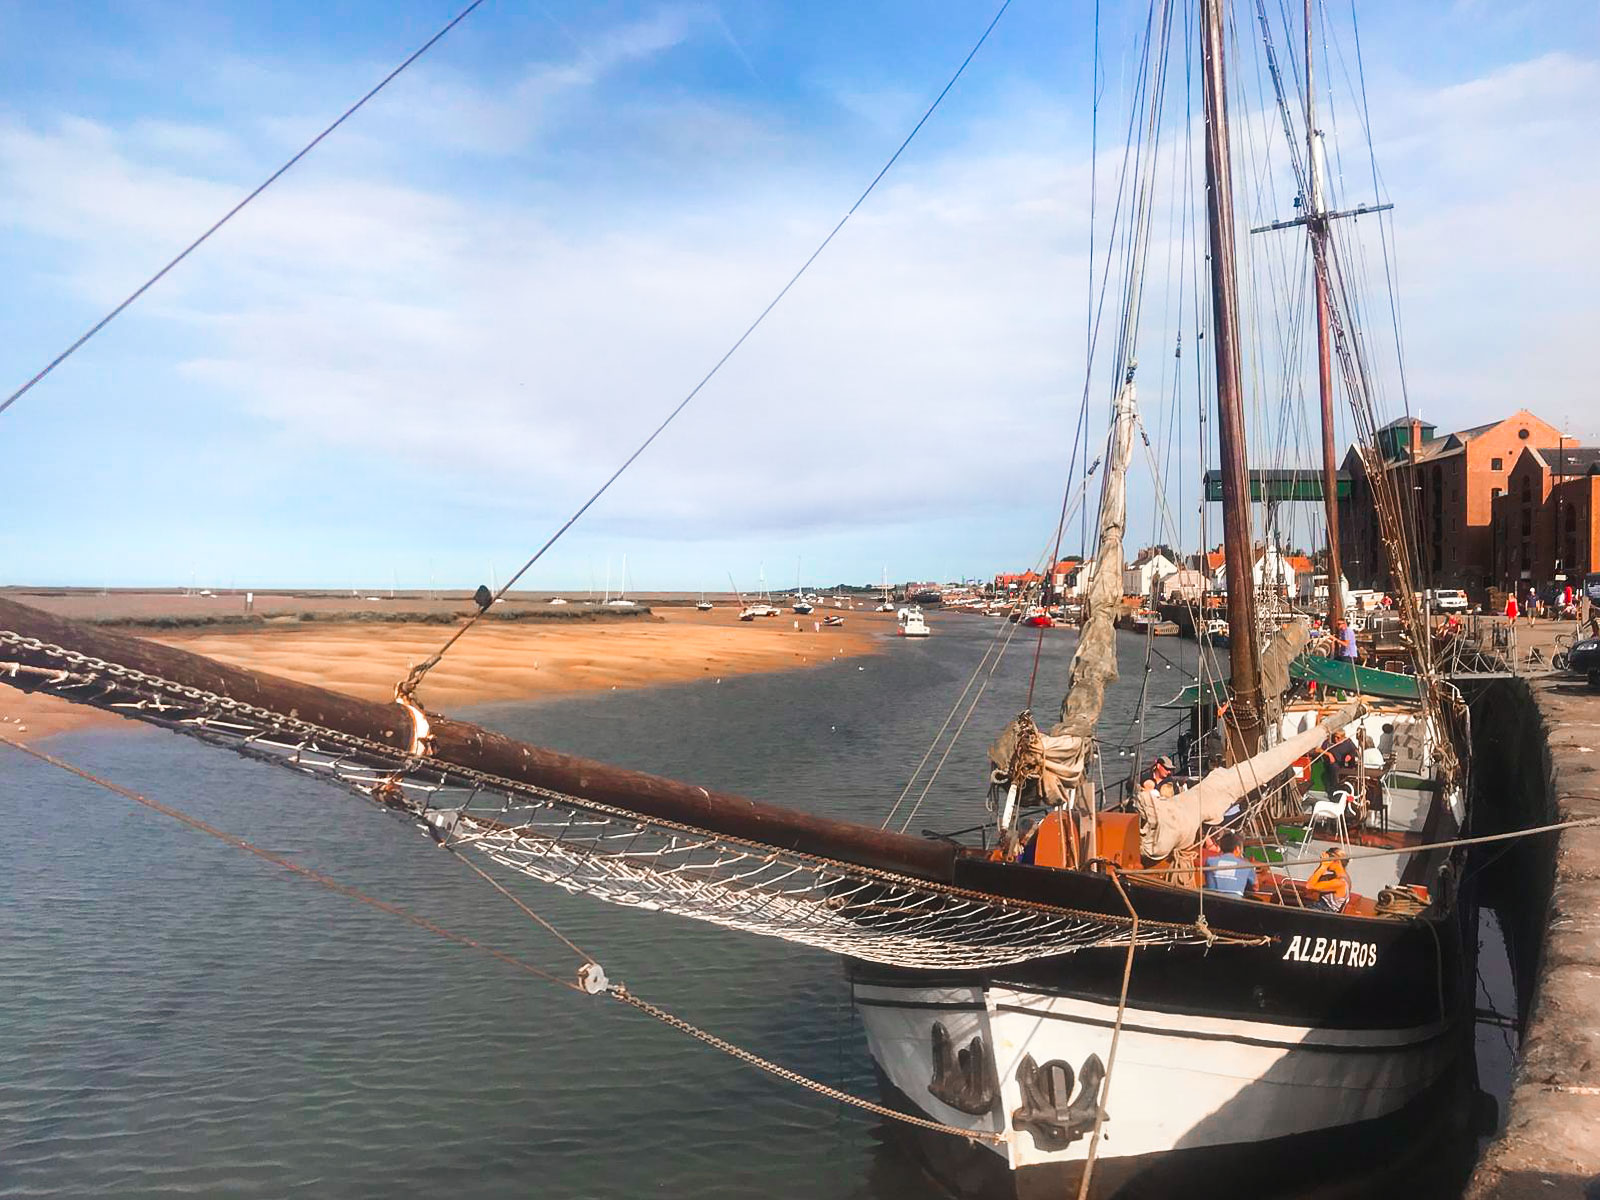 Wells-Next-The-Sea's - The Albatros - restaurant on a former dutch cargo ship.